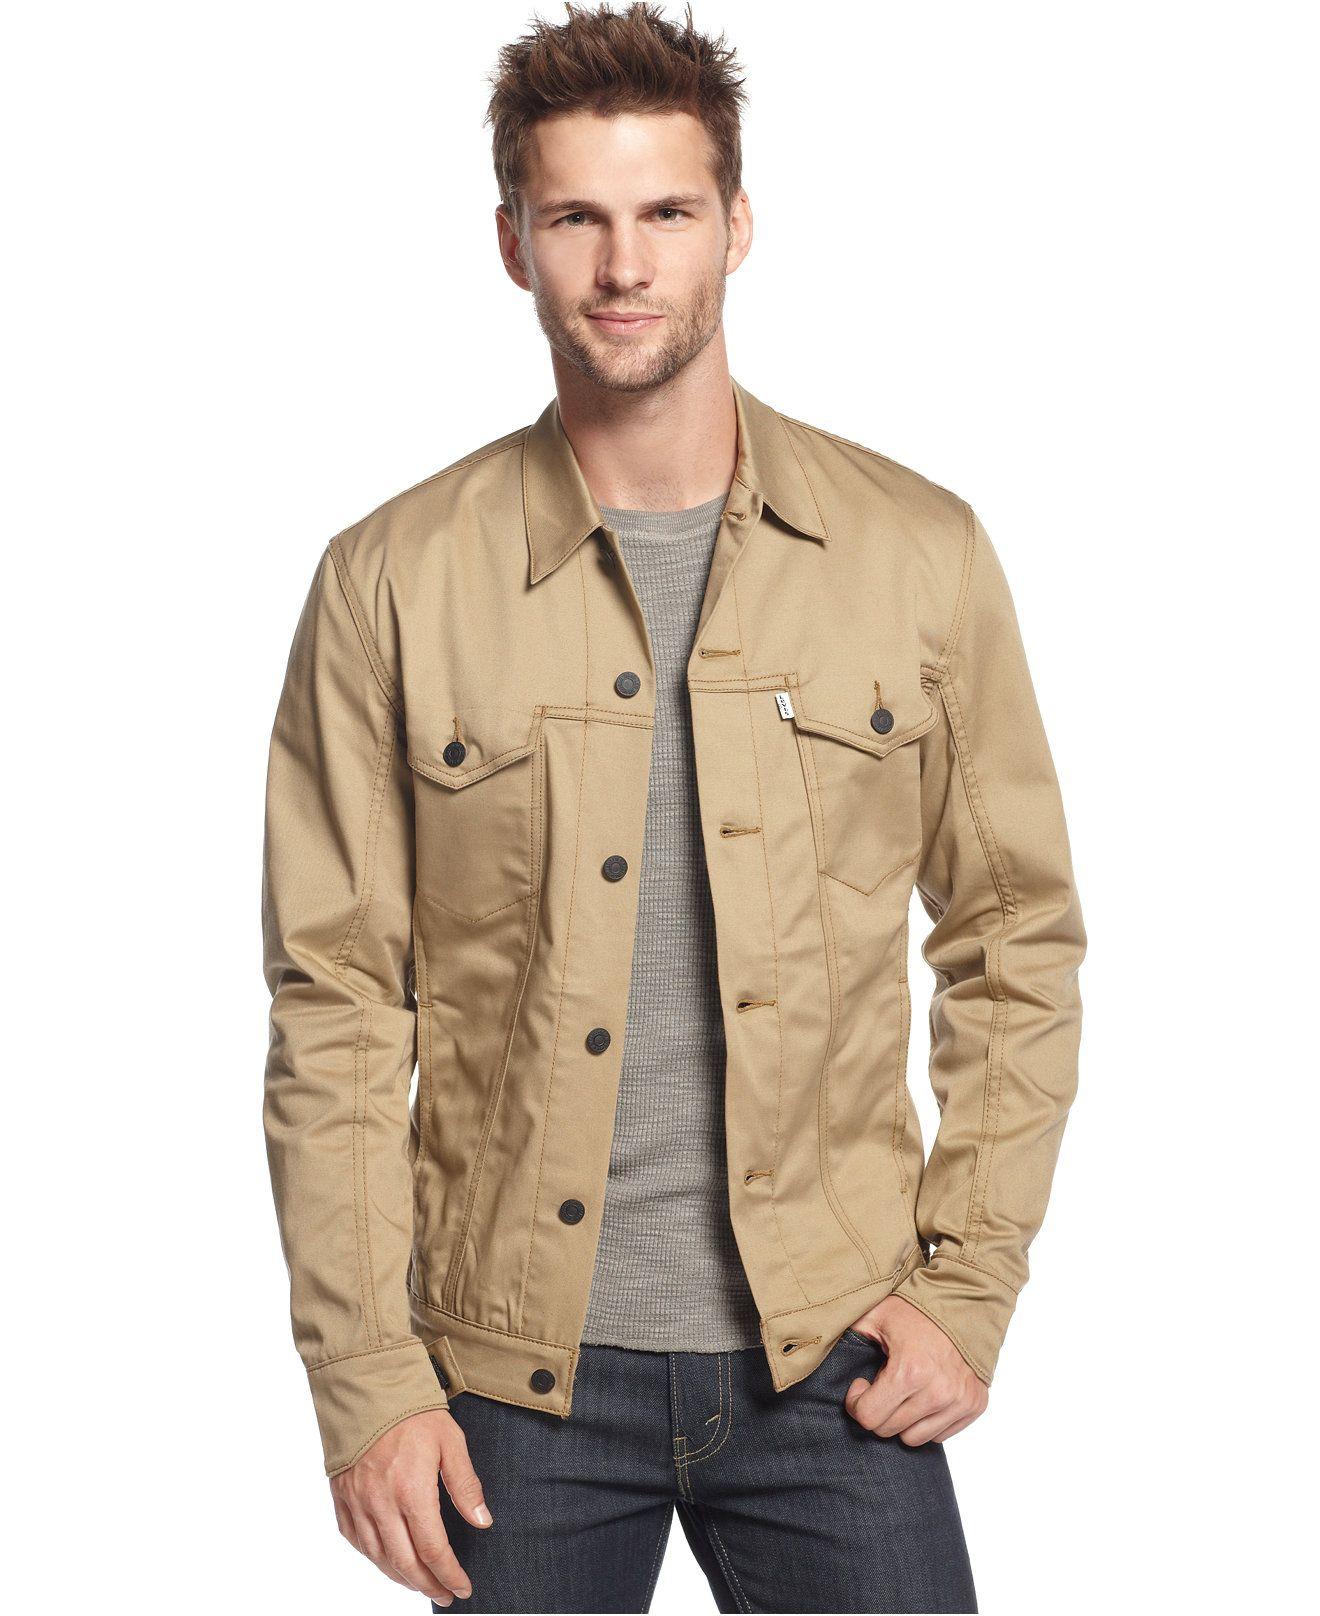 Levi S Commuter Harvest Gold Twill Trucker Jacket Coats Jackets Men Macy S Trucker Jacket Men Trucker Jacket Stylish Men Casual [ 1616 x 1320 Pixel ]